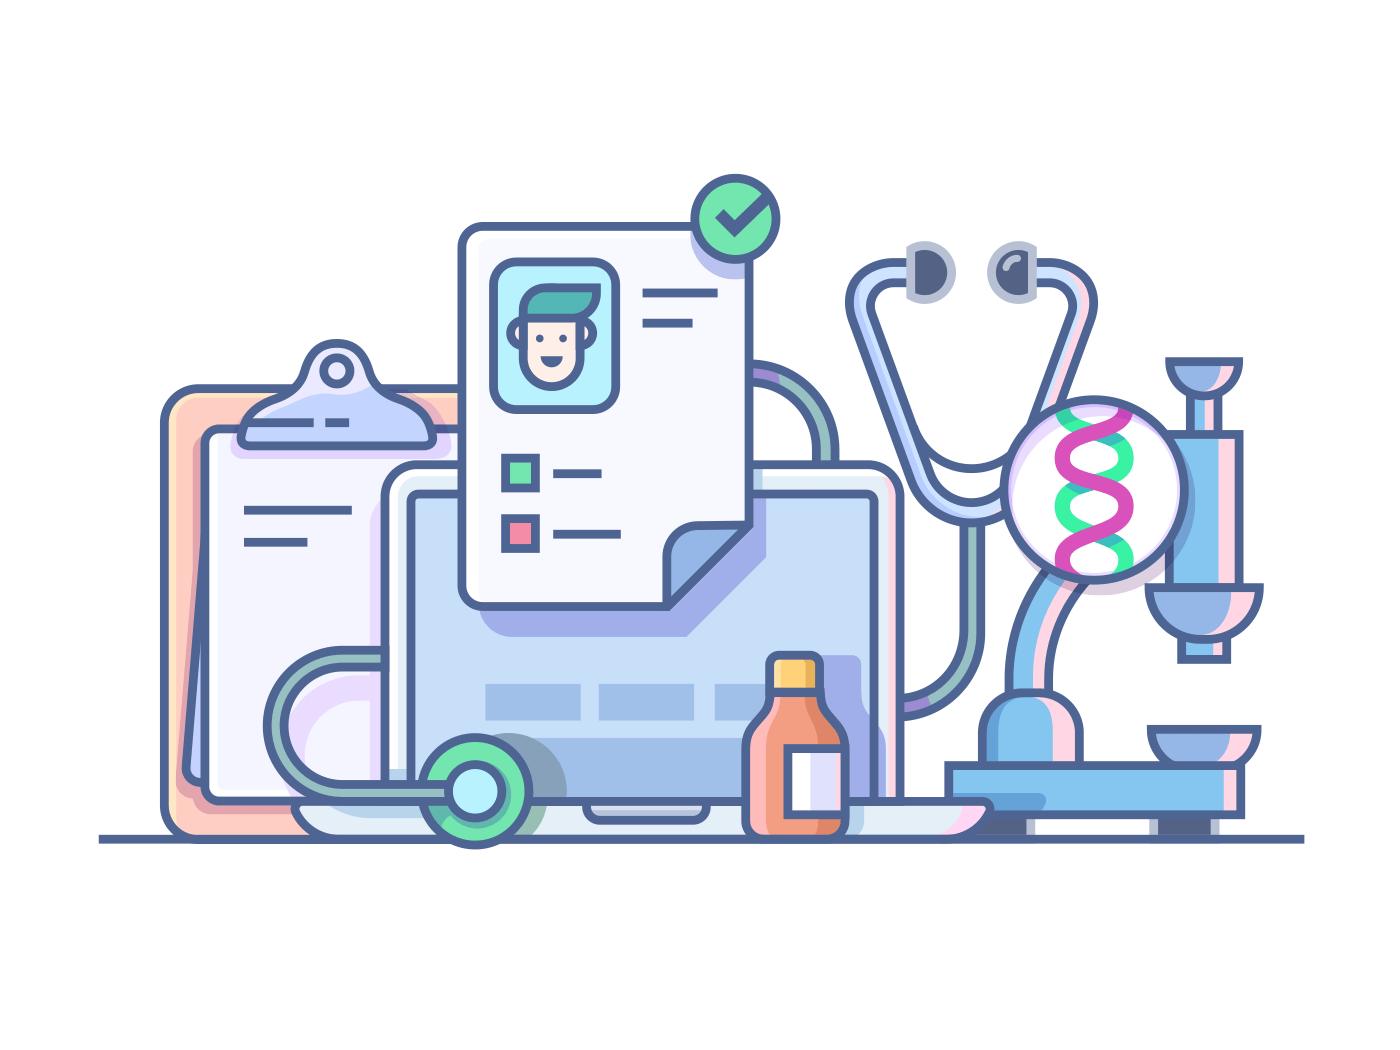 Medical accessories vector illustration